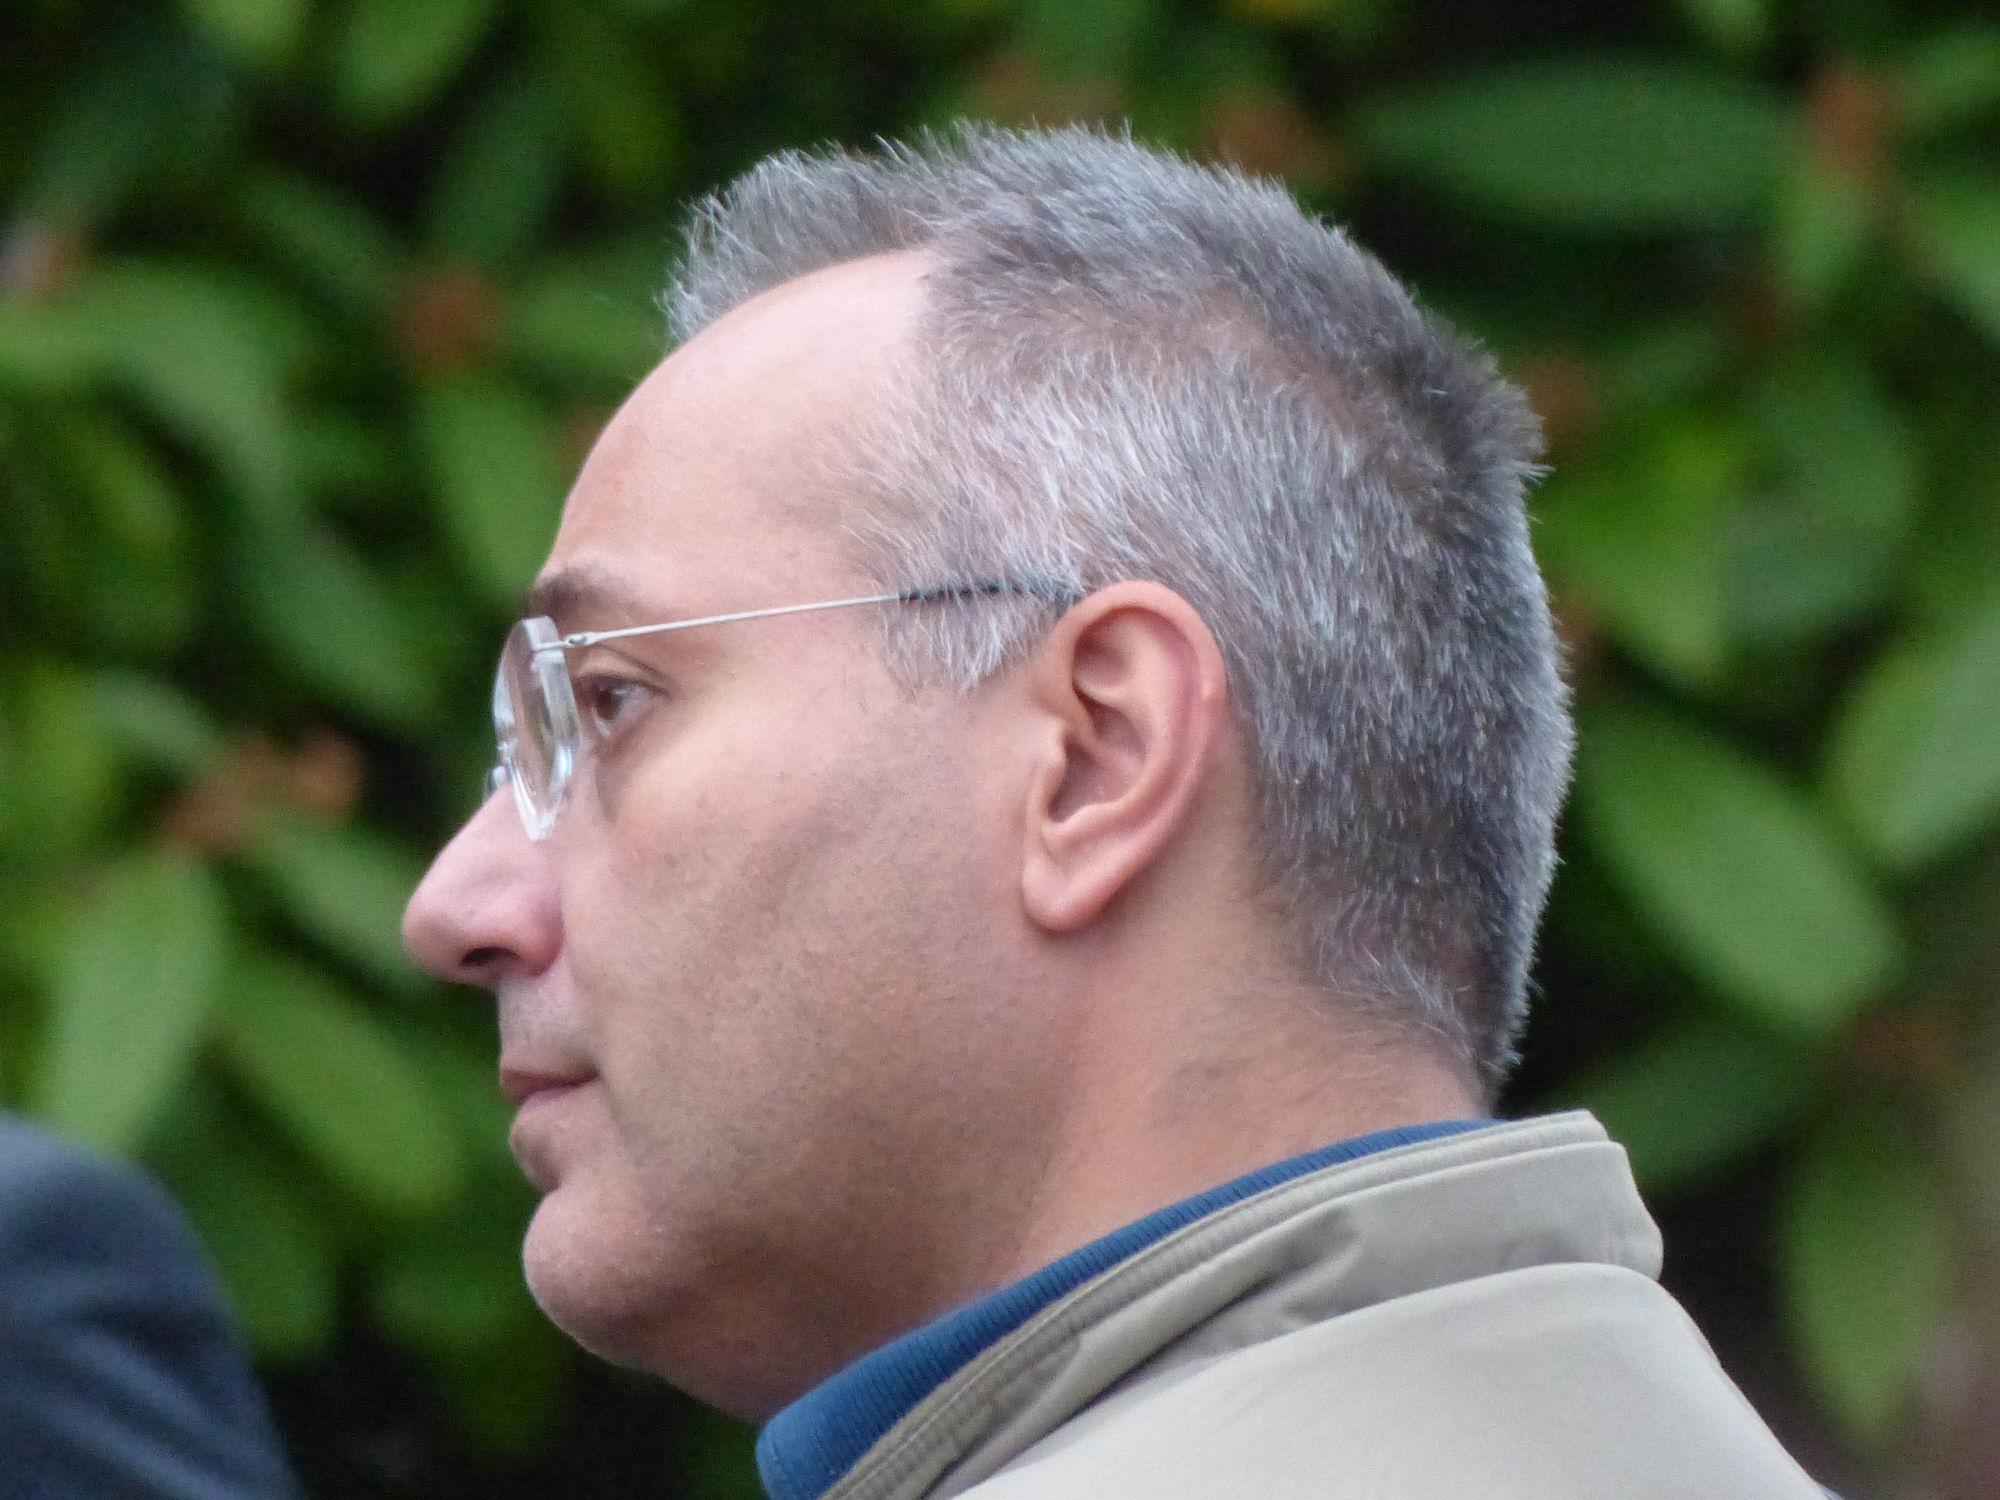 Maurizio Arfaioli